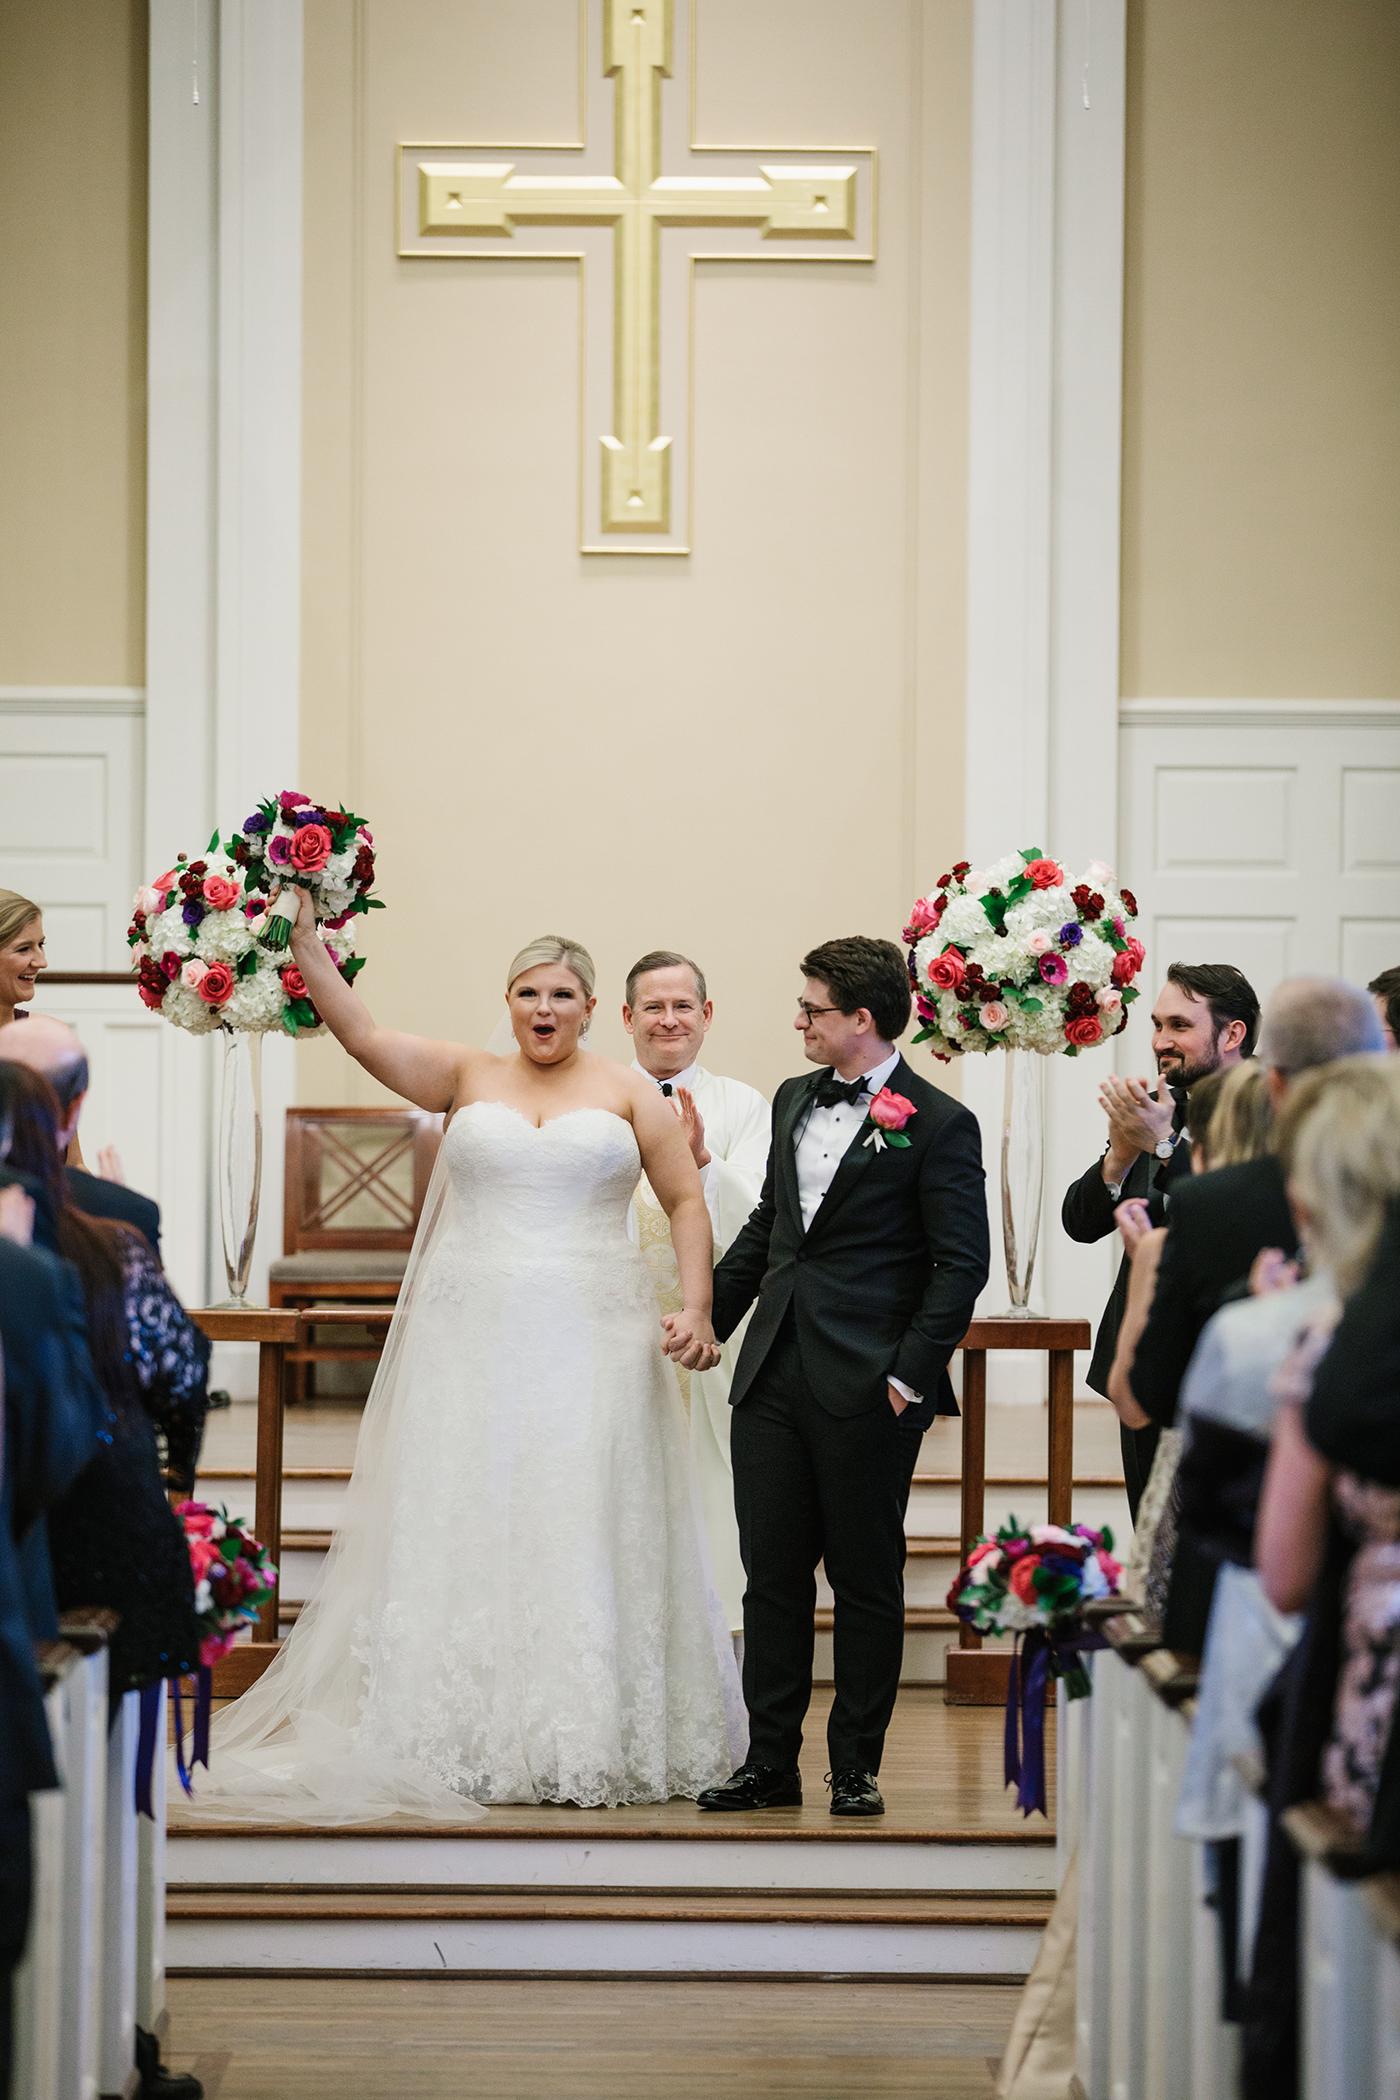 Dallas Weddings Planner - Allday Events - Katie + Matthew at The Adolphus Hotel - 402.jpg